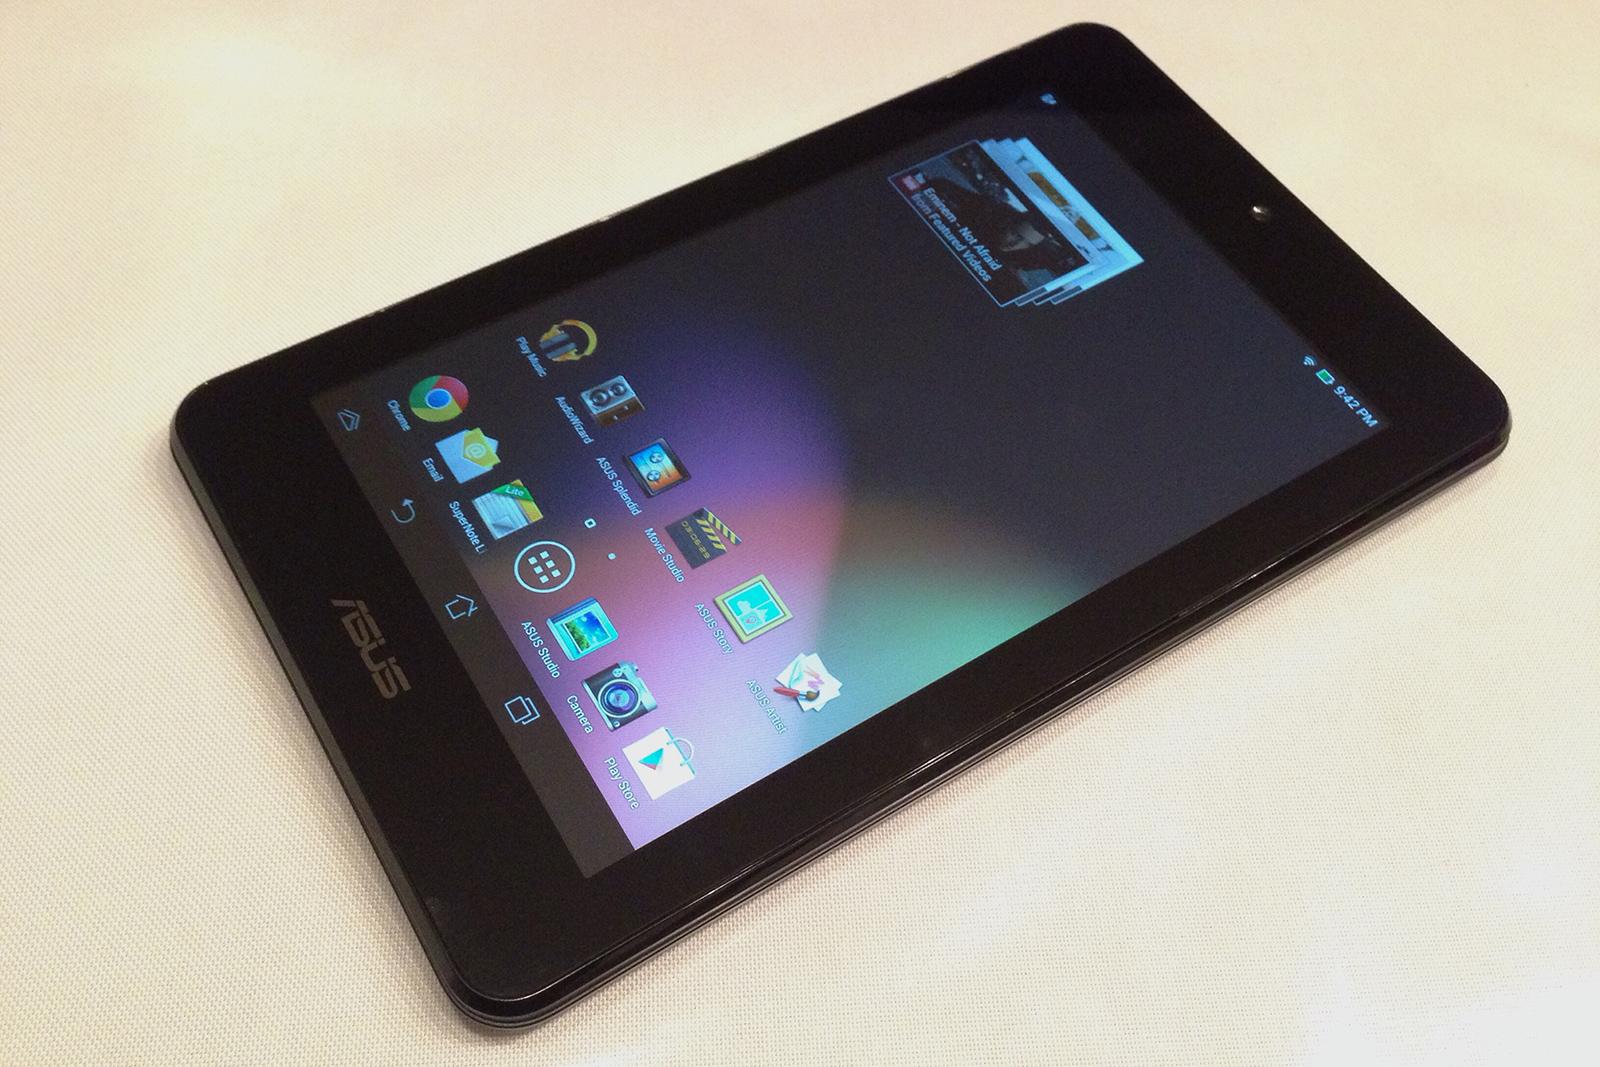 1392758224544 - Test de la tablette Asus Memo Pad HD 7